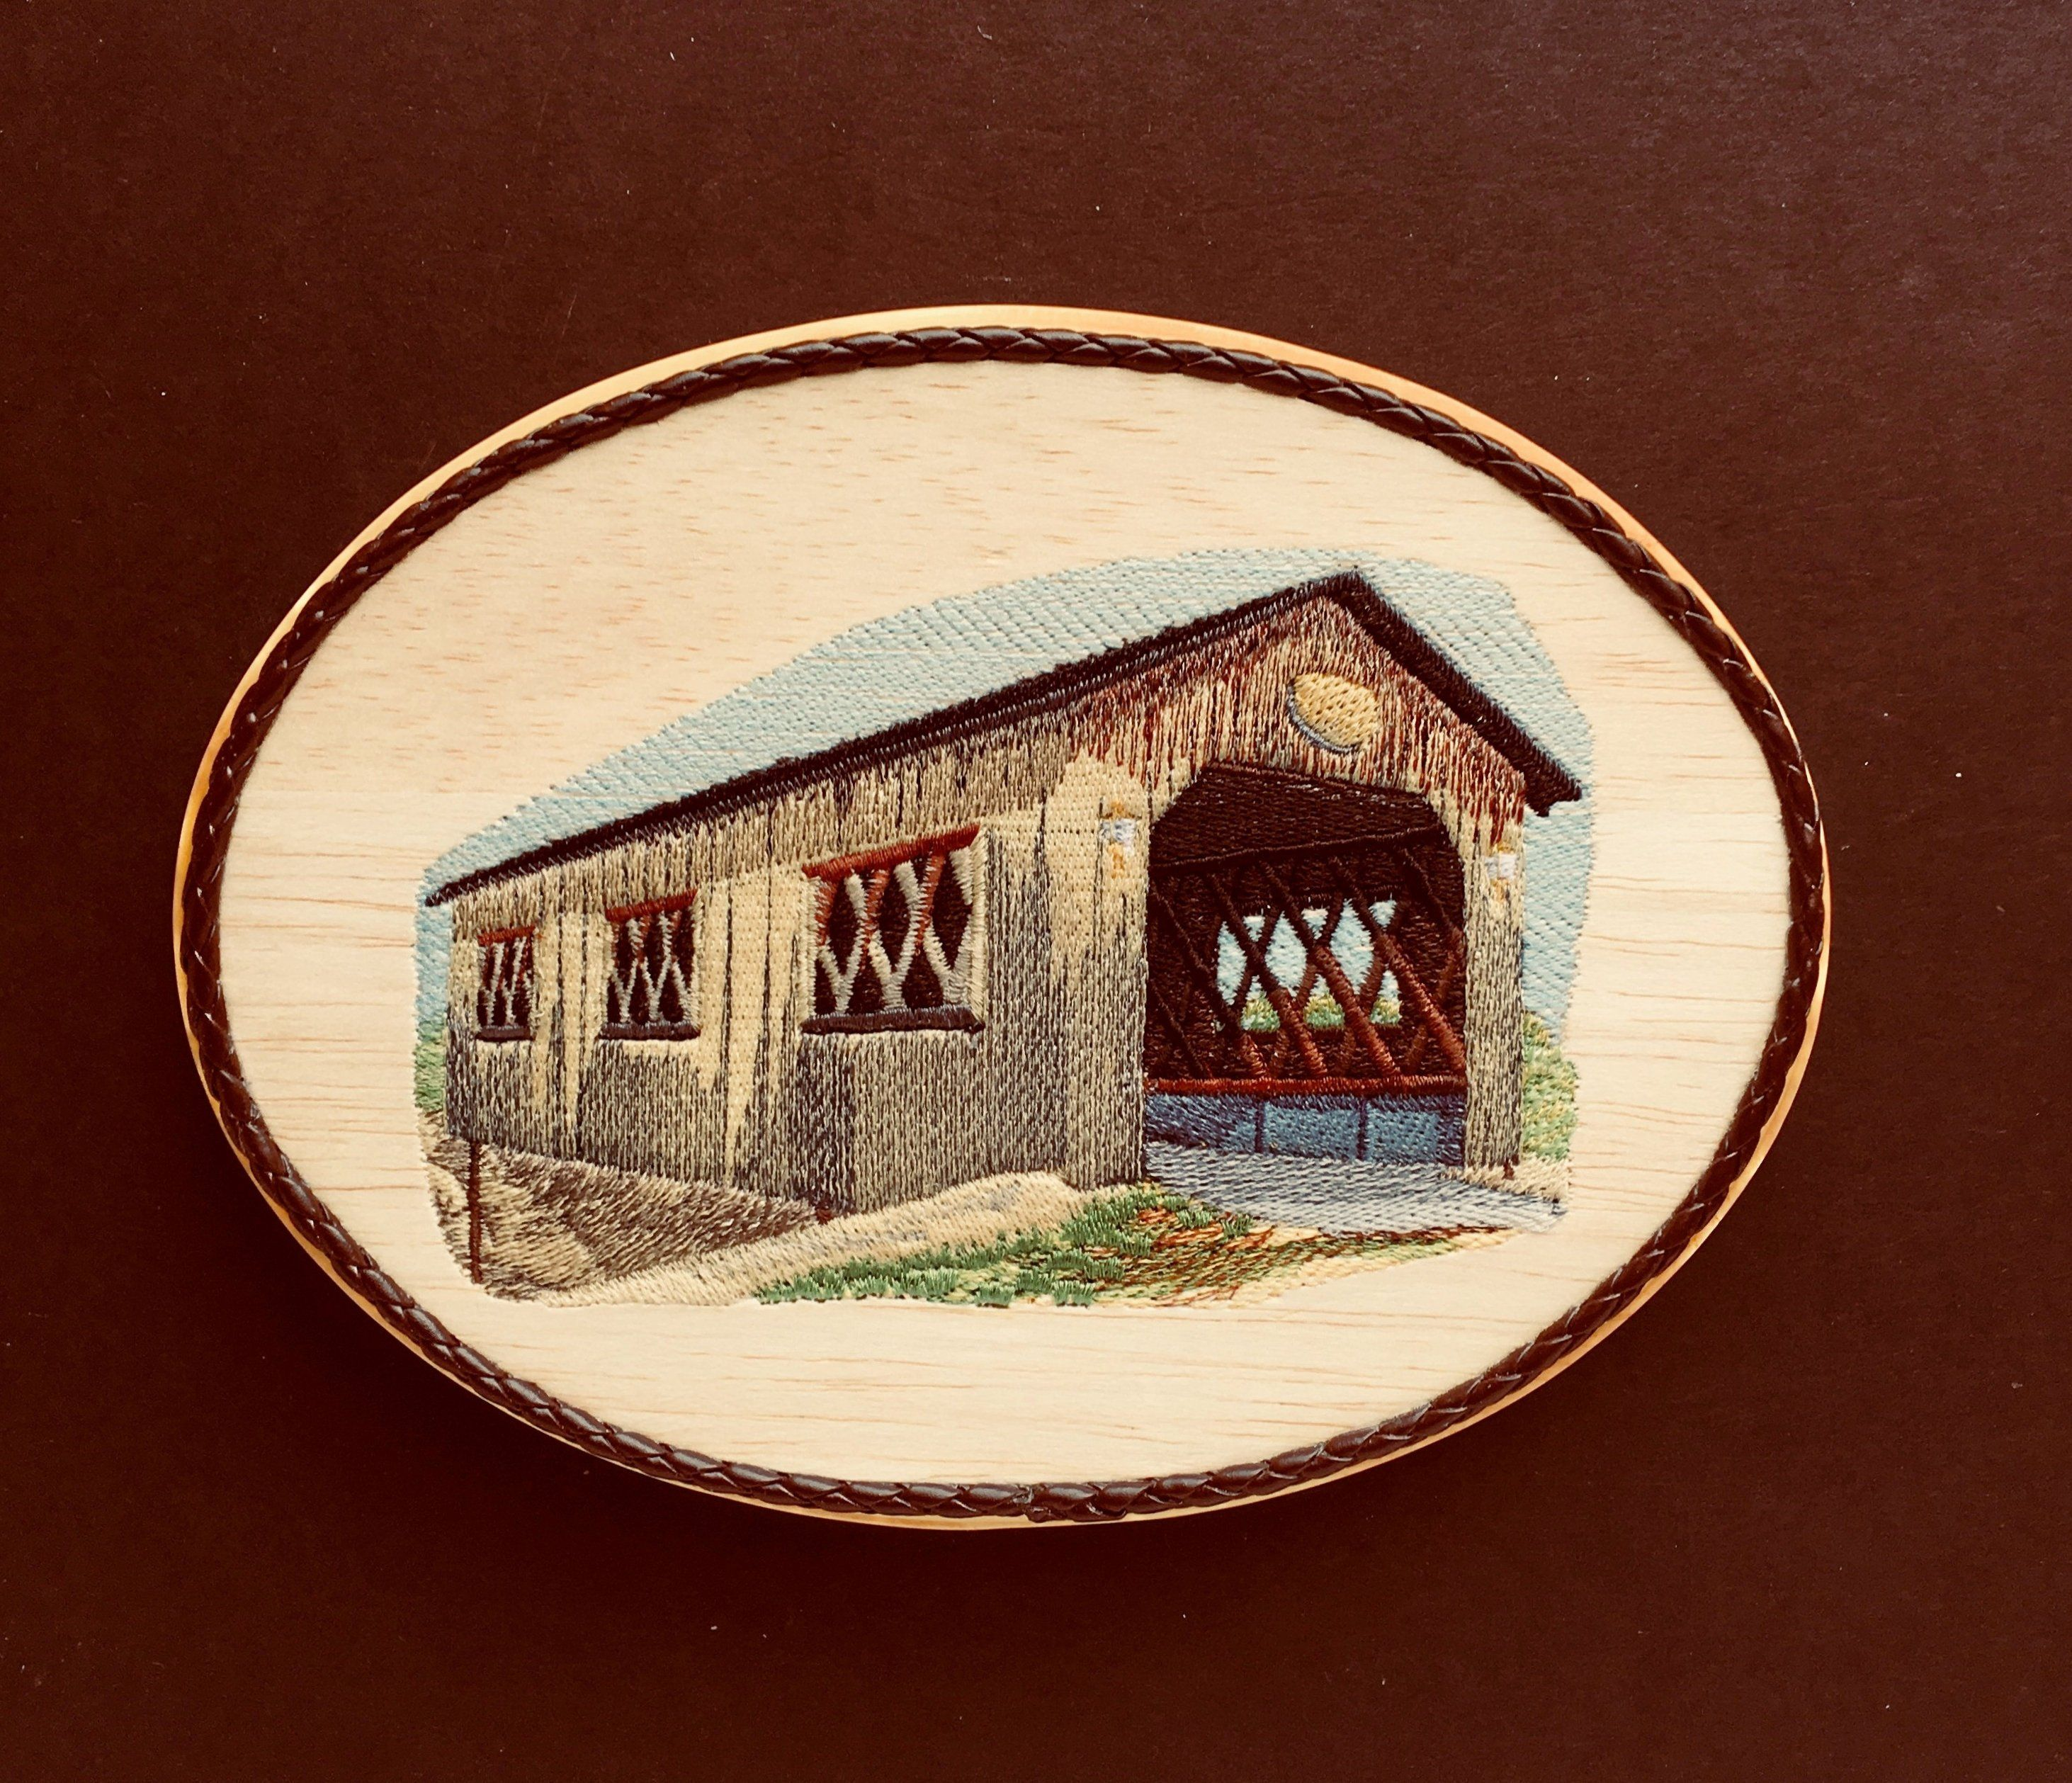 Covered bridge embroidery art on balsa wood rustic home decor